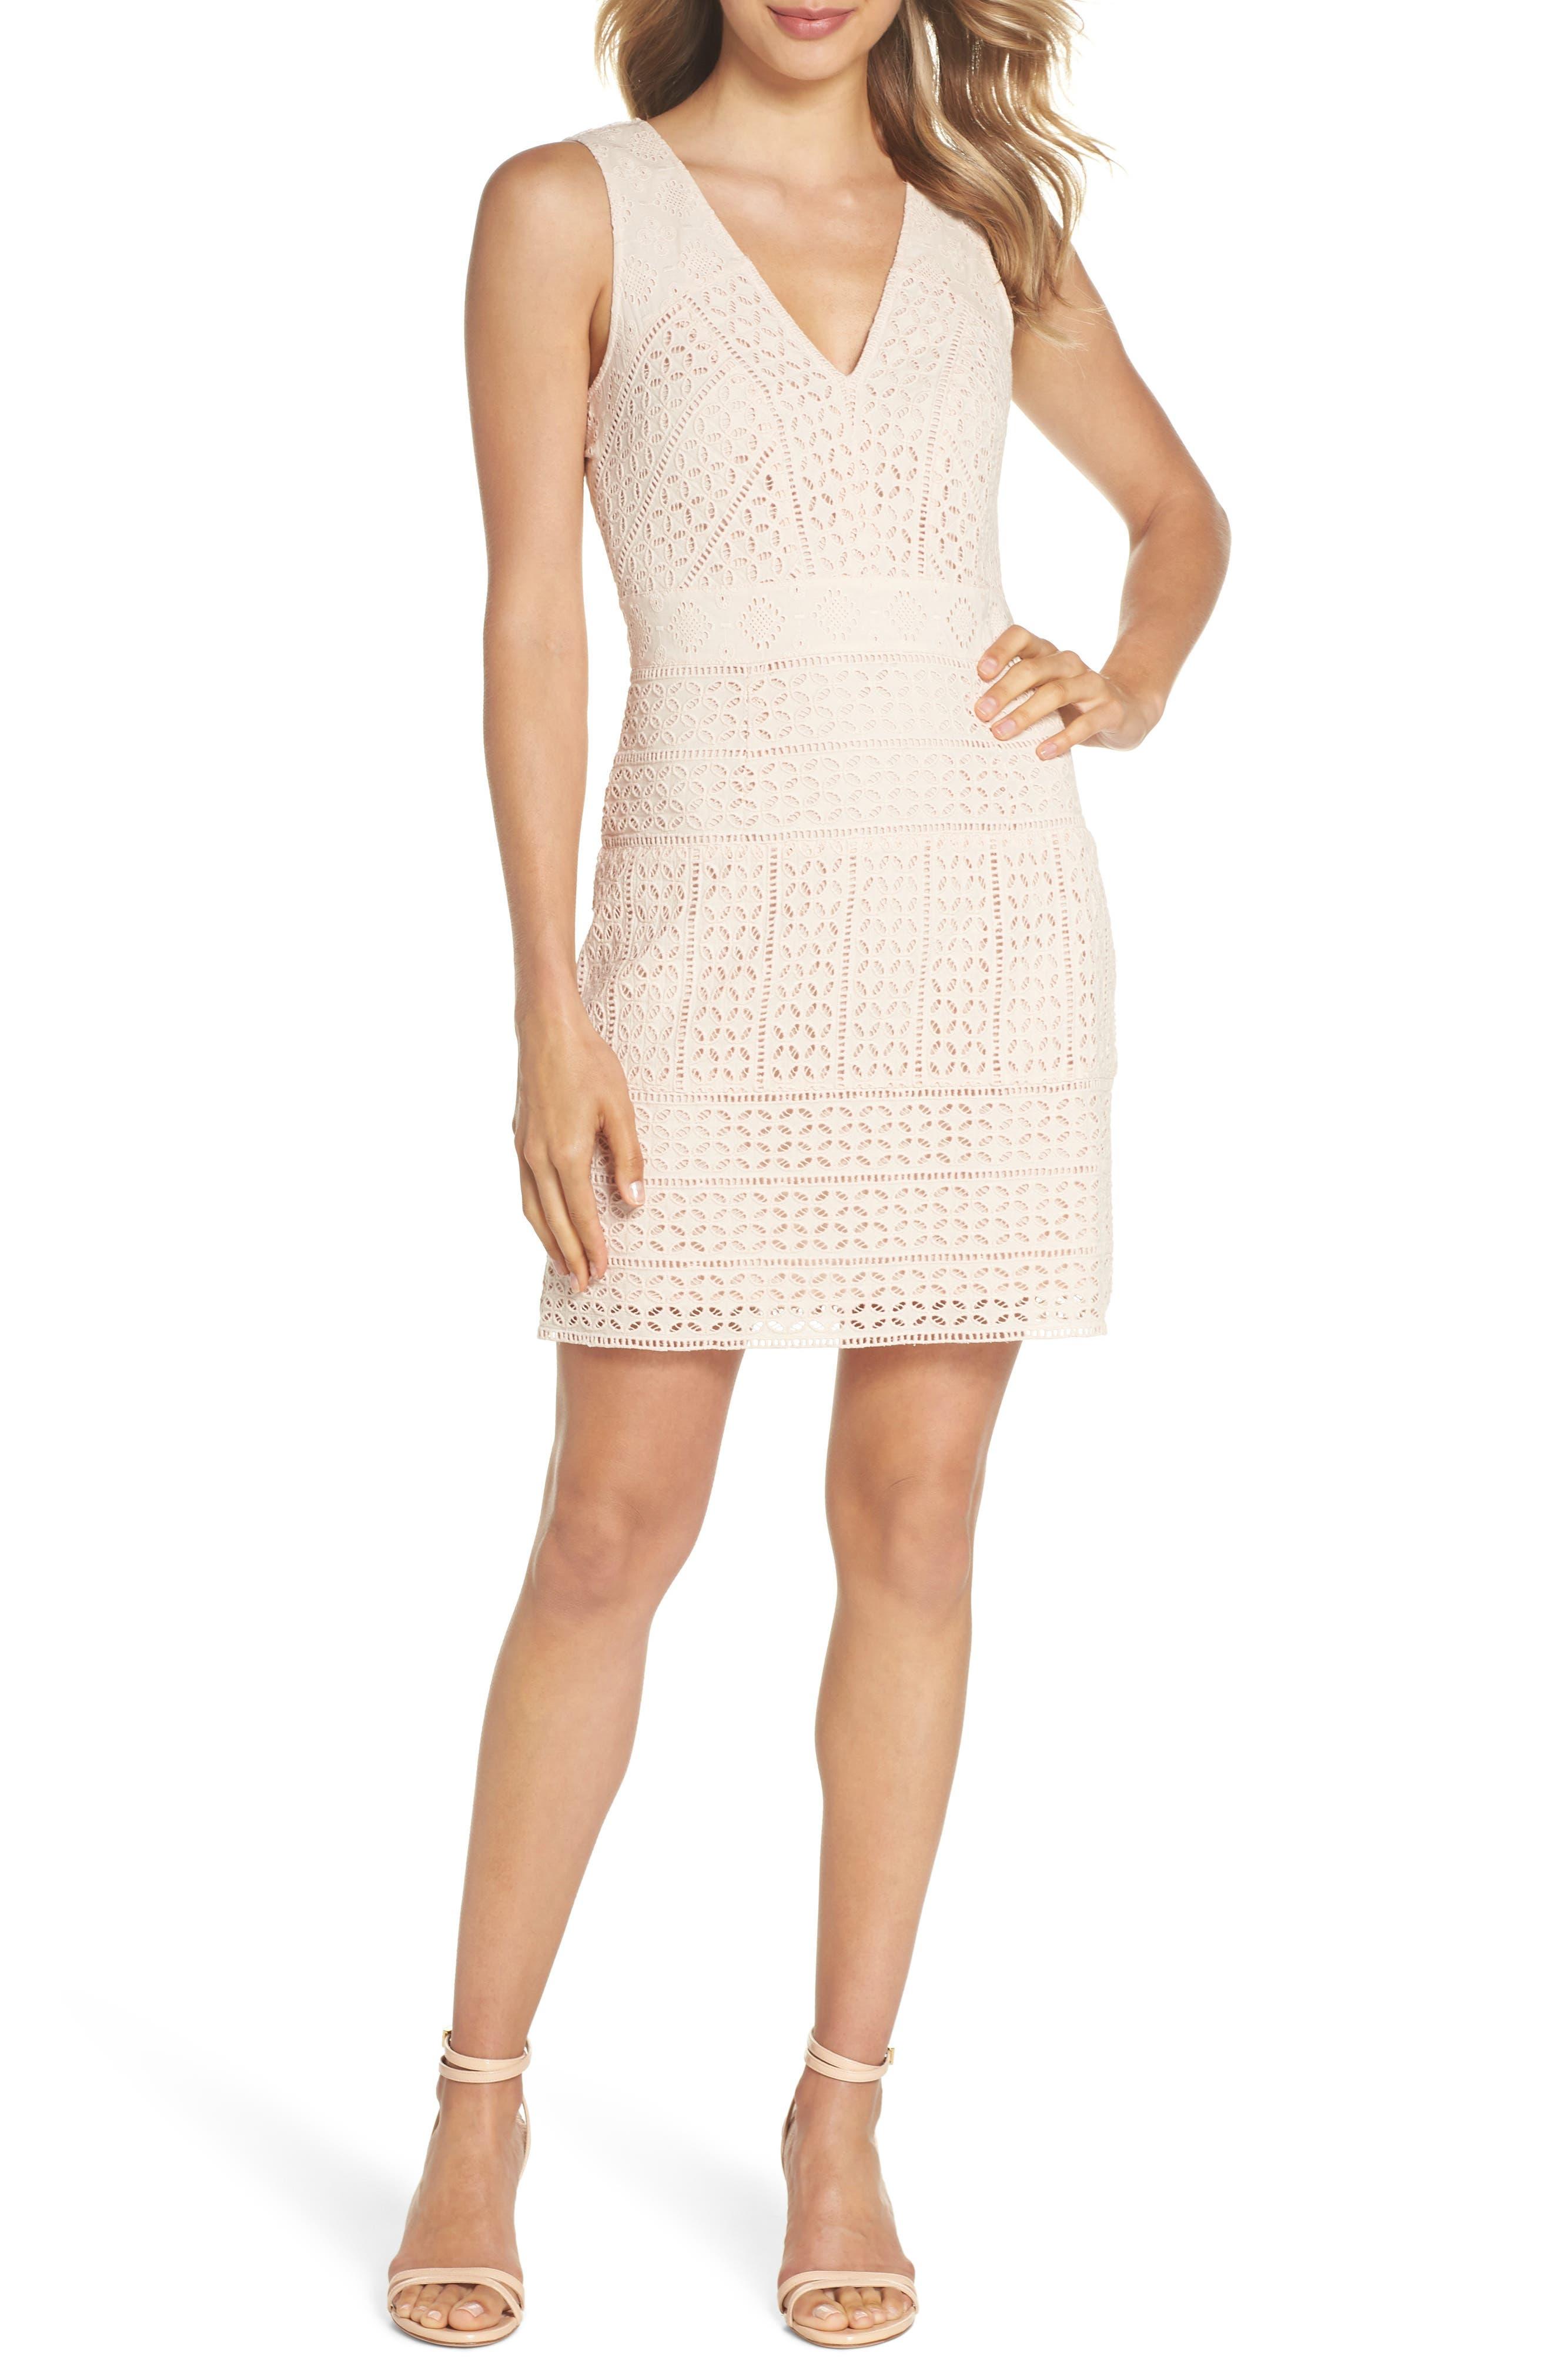 Schiffley Summer Cage Cotton Dress,                             Main thumbnail 1, color,                             687